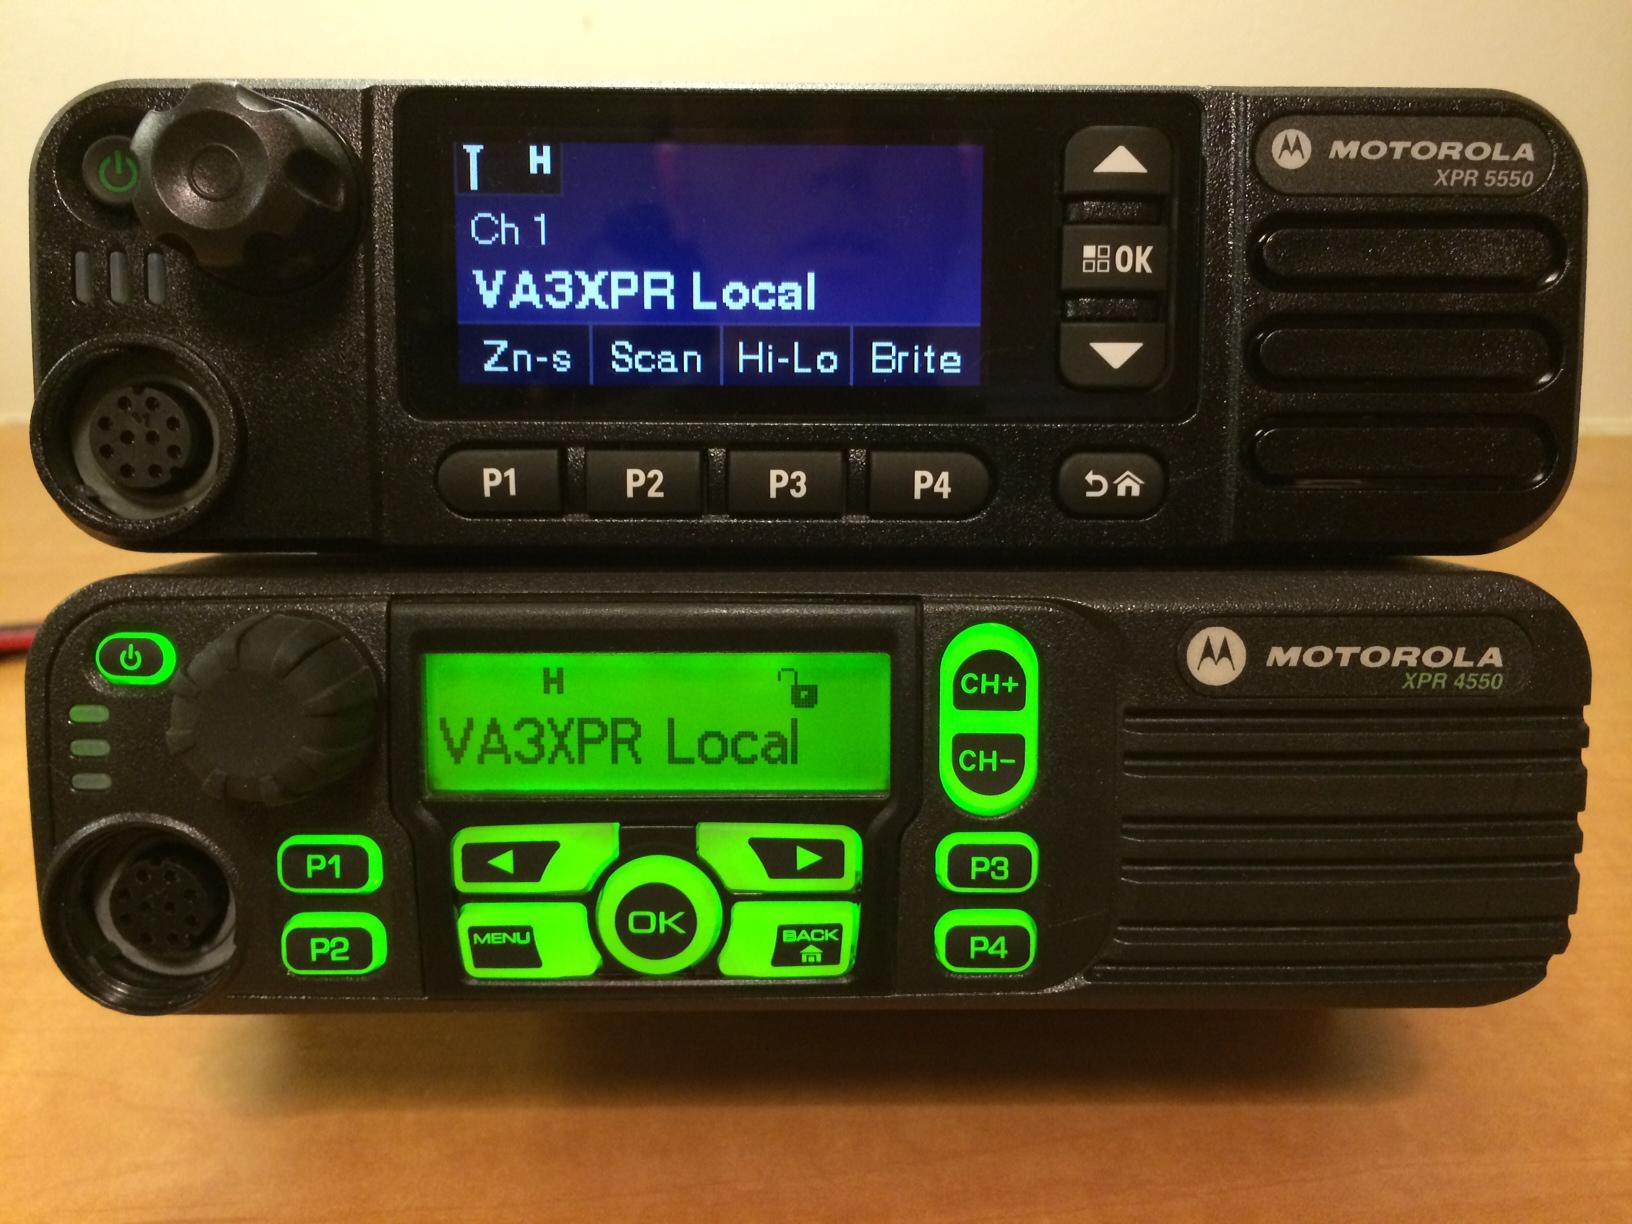 Motorola Cdm1250 Wiring Diagram Electrical Cdm750 Cb Radio Xtl 1500